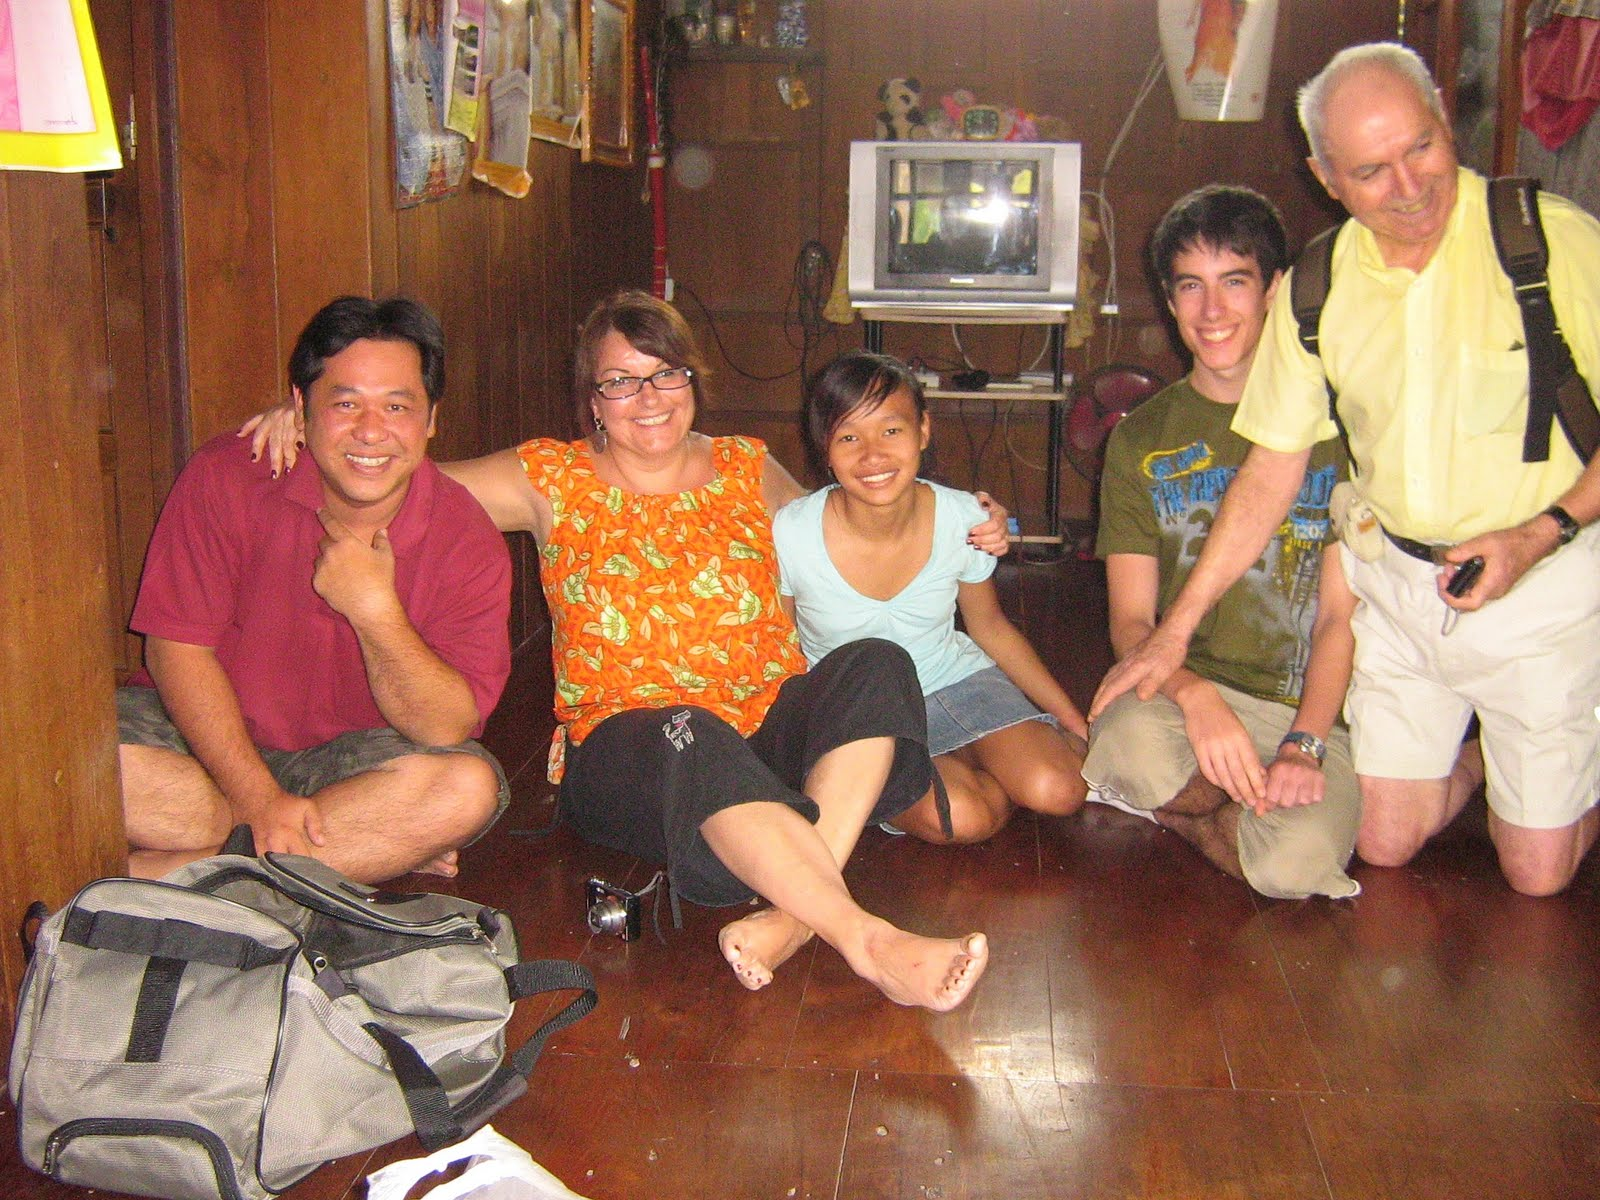 http://3.bp.blogspot.com/_JZN0FCJye5k/S8cKBWv4xFI/AAAAAAAAAl0/xAXFikpKYsA/s1600/Chez+Kinarree+avec+Tom.JPG